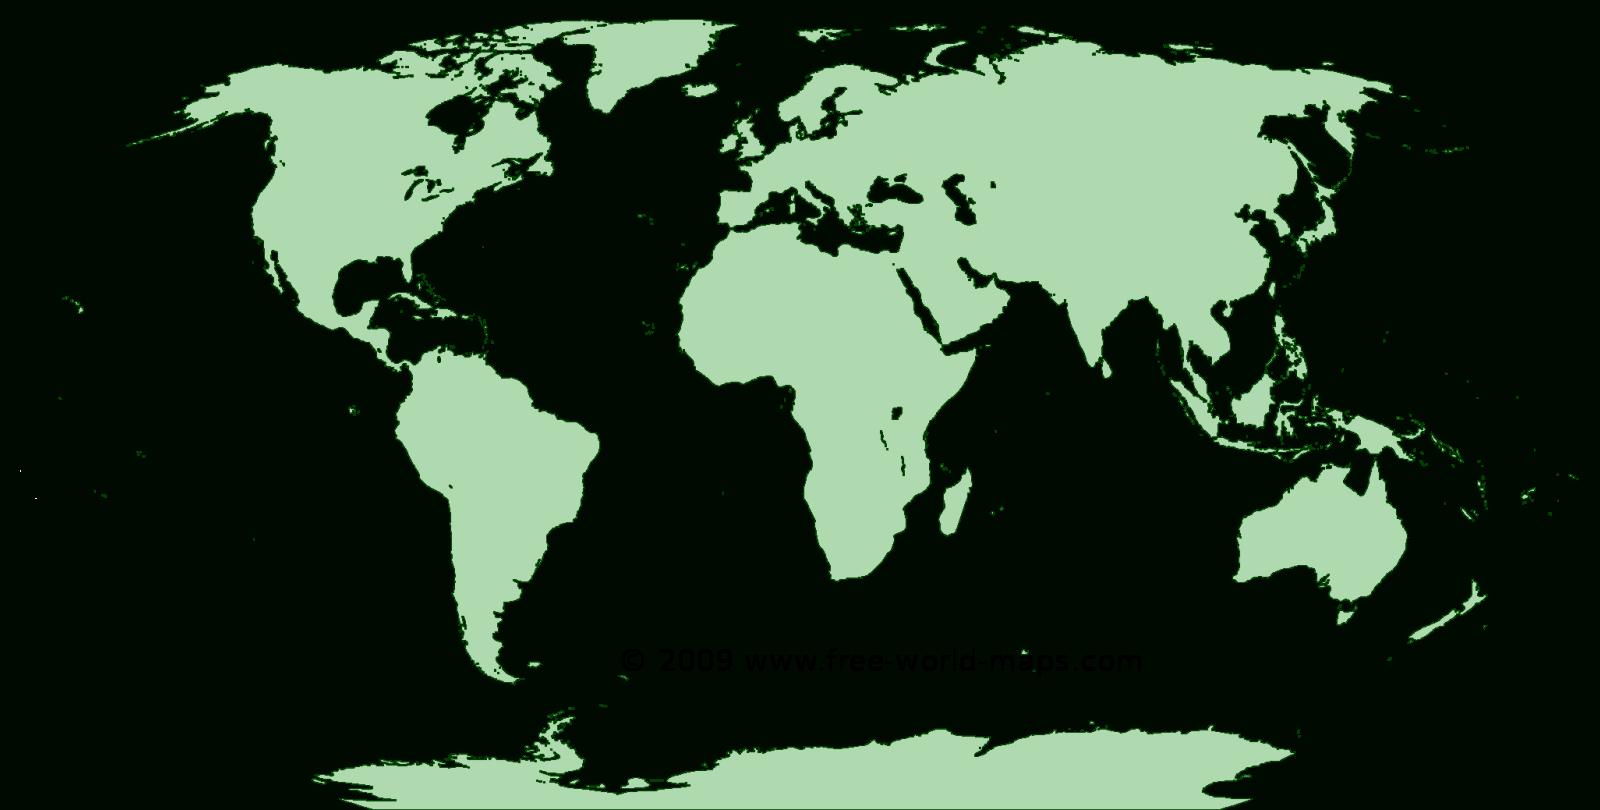 Printable Blank World Maps | Free World Maps - Free Printable World Map